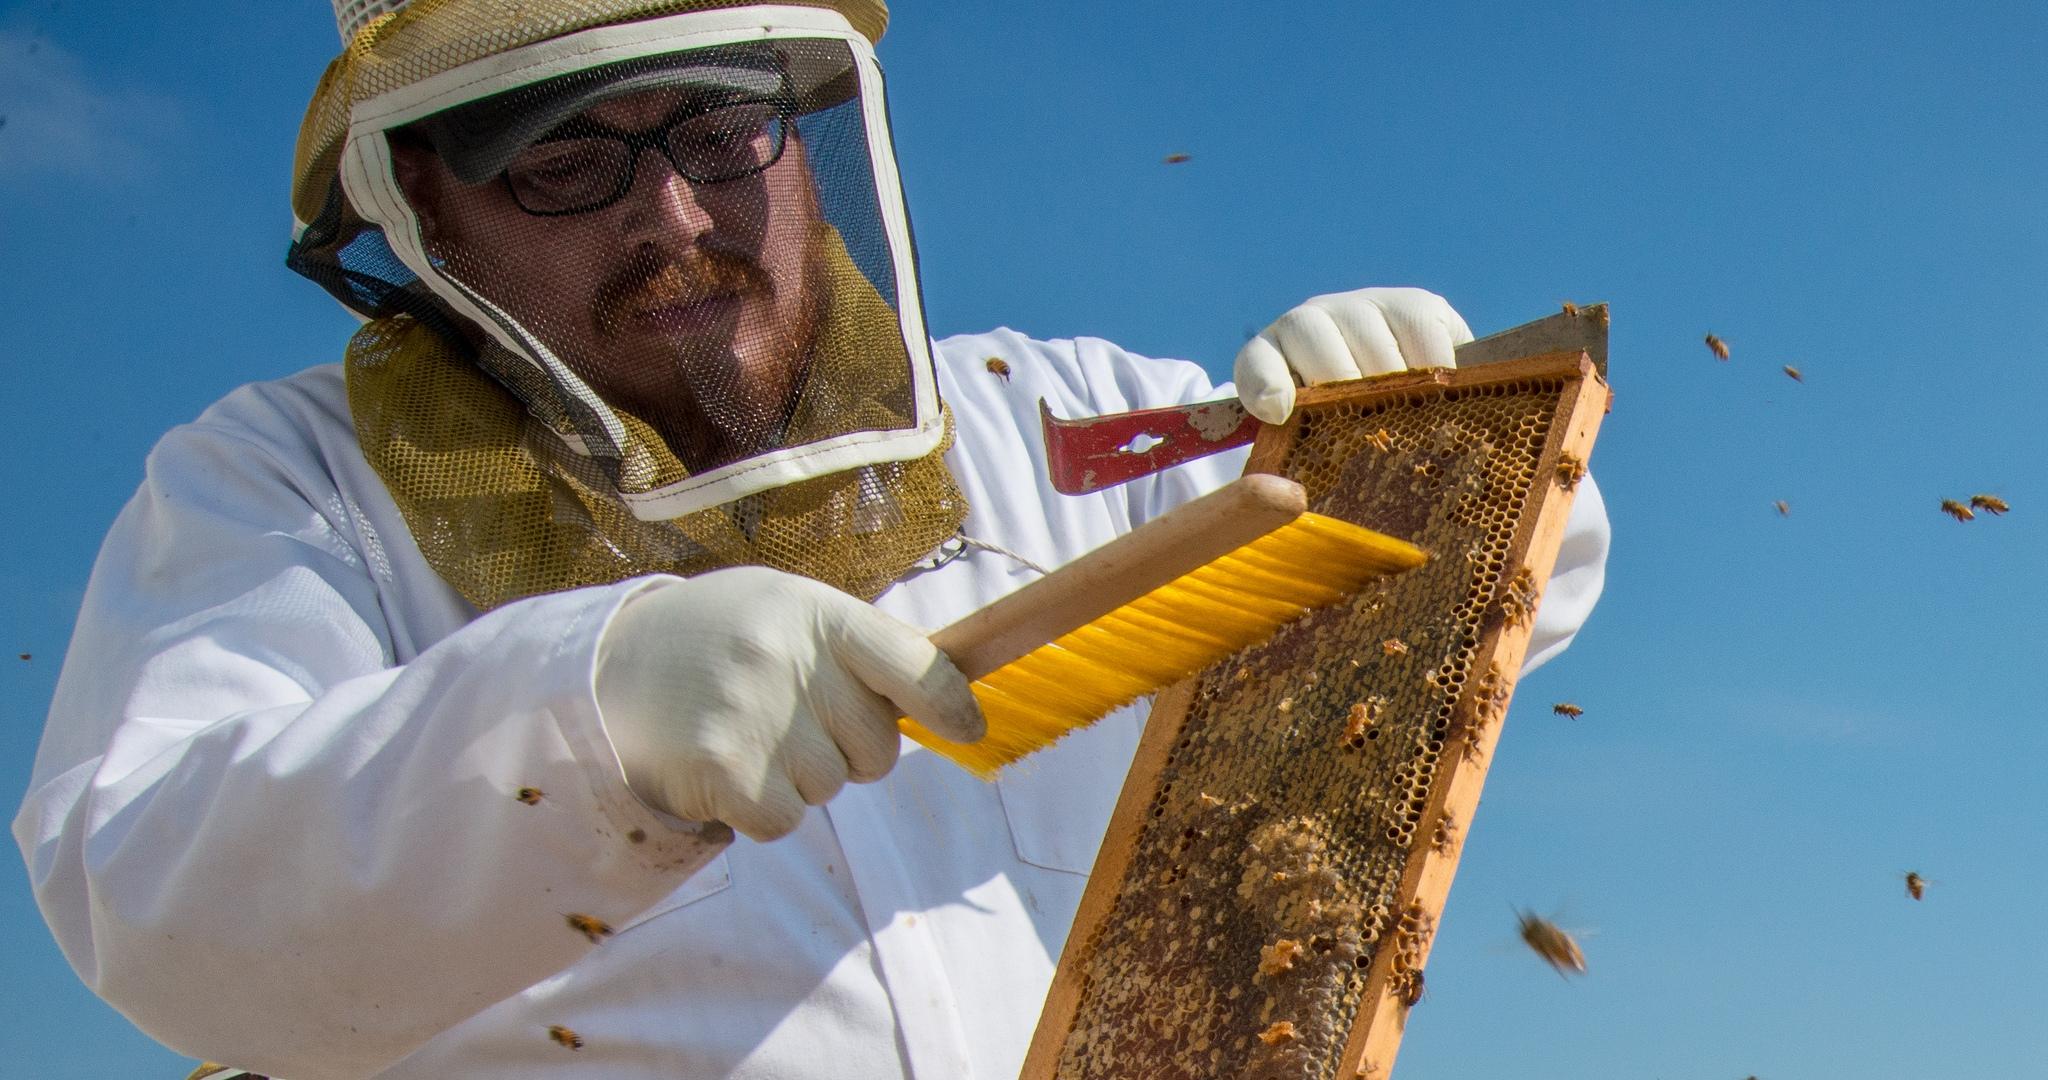 U S  honey industry contributes more than $4 7 billion to economy